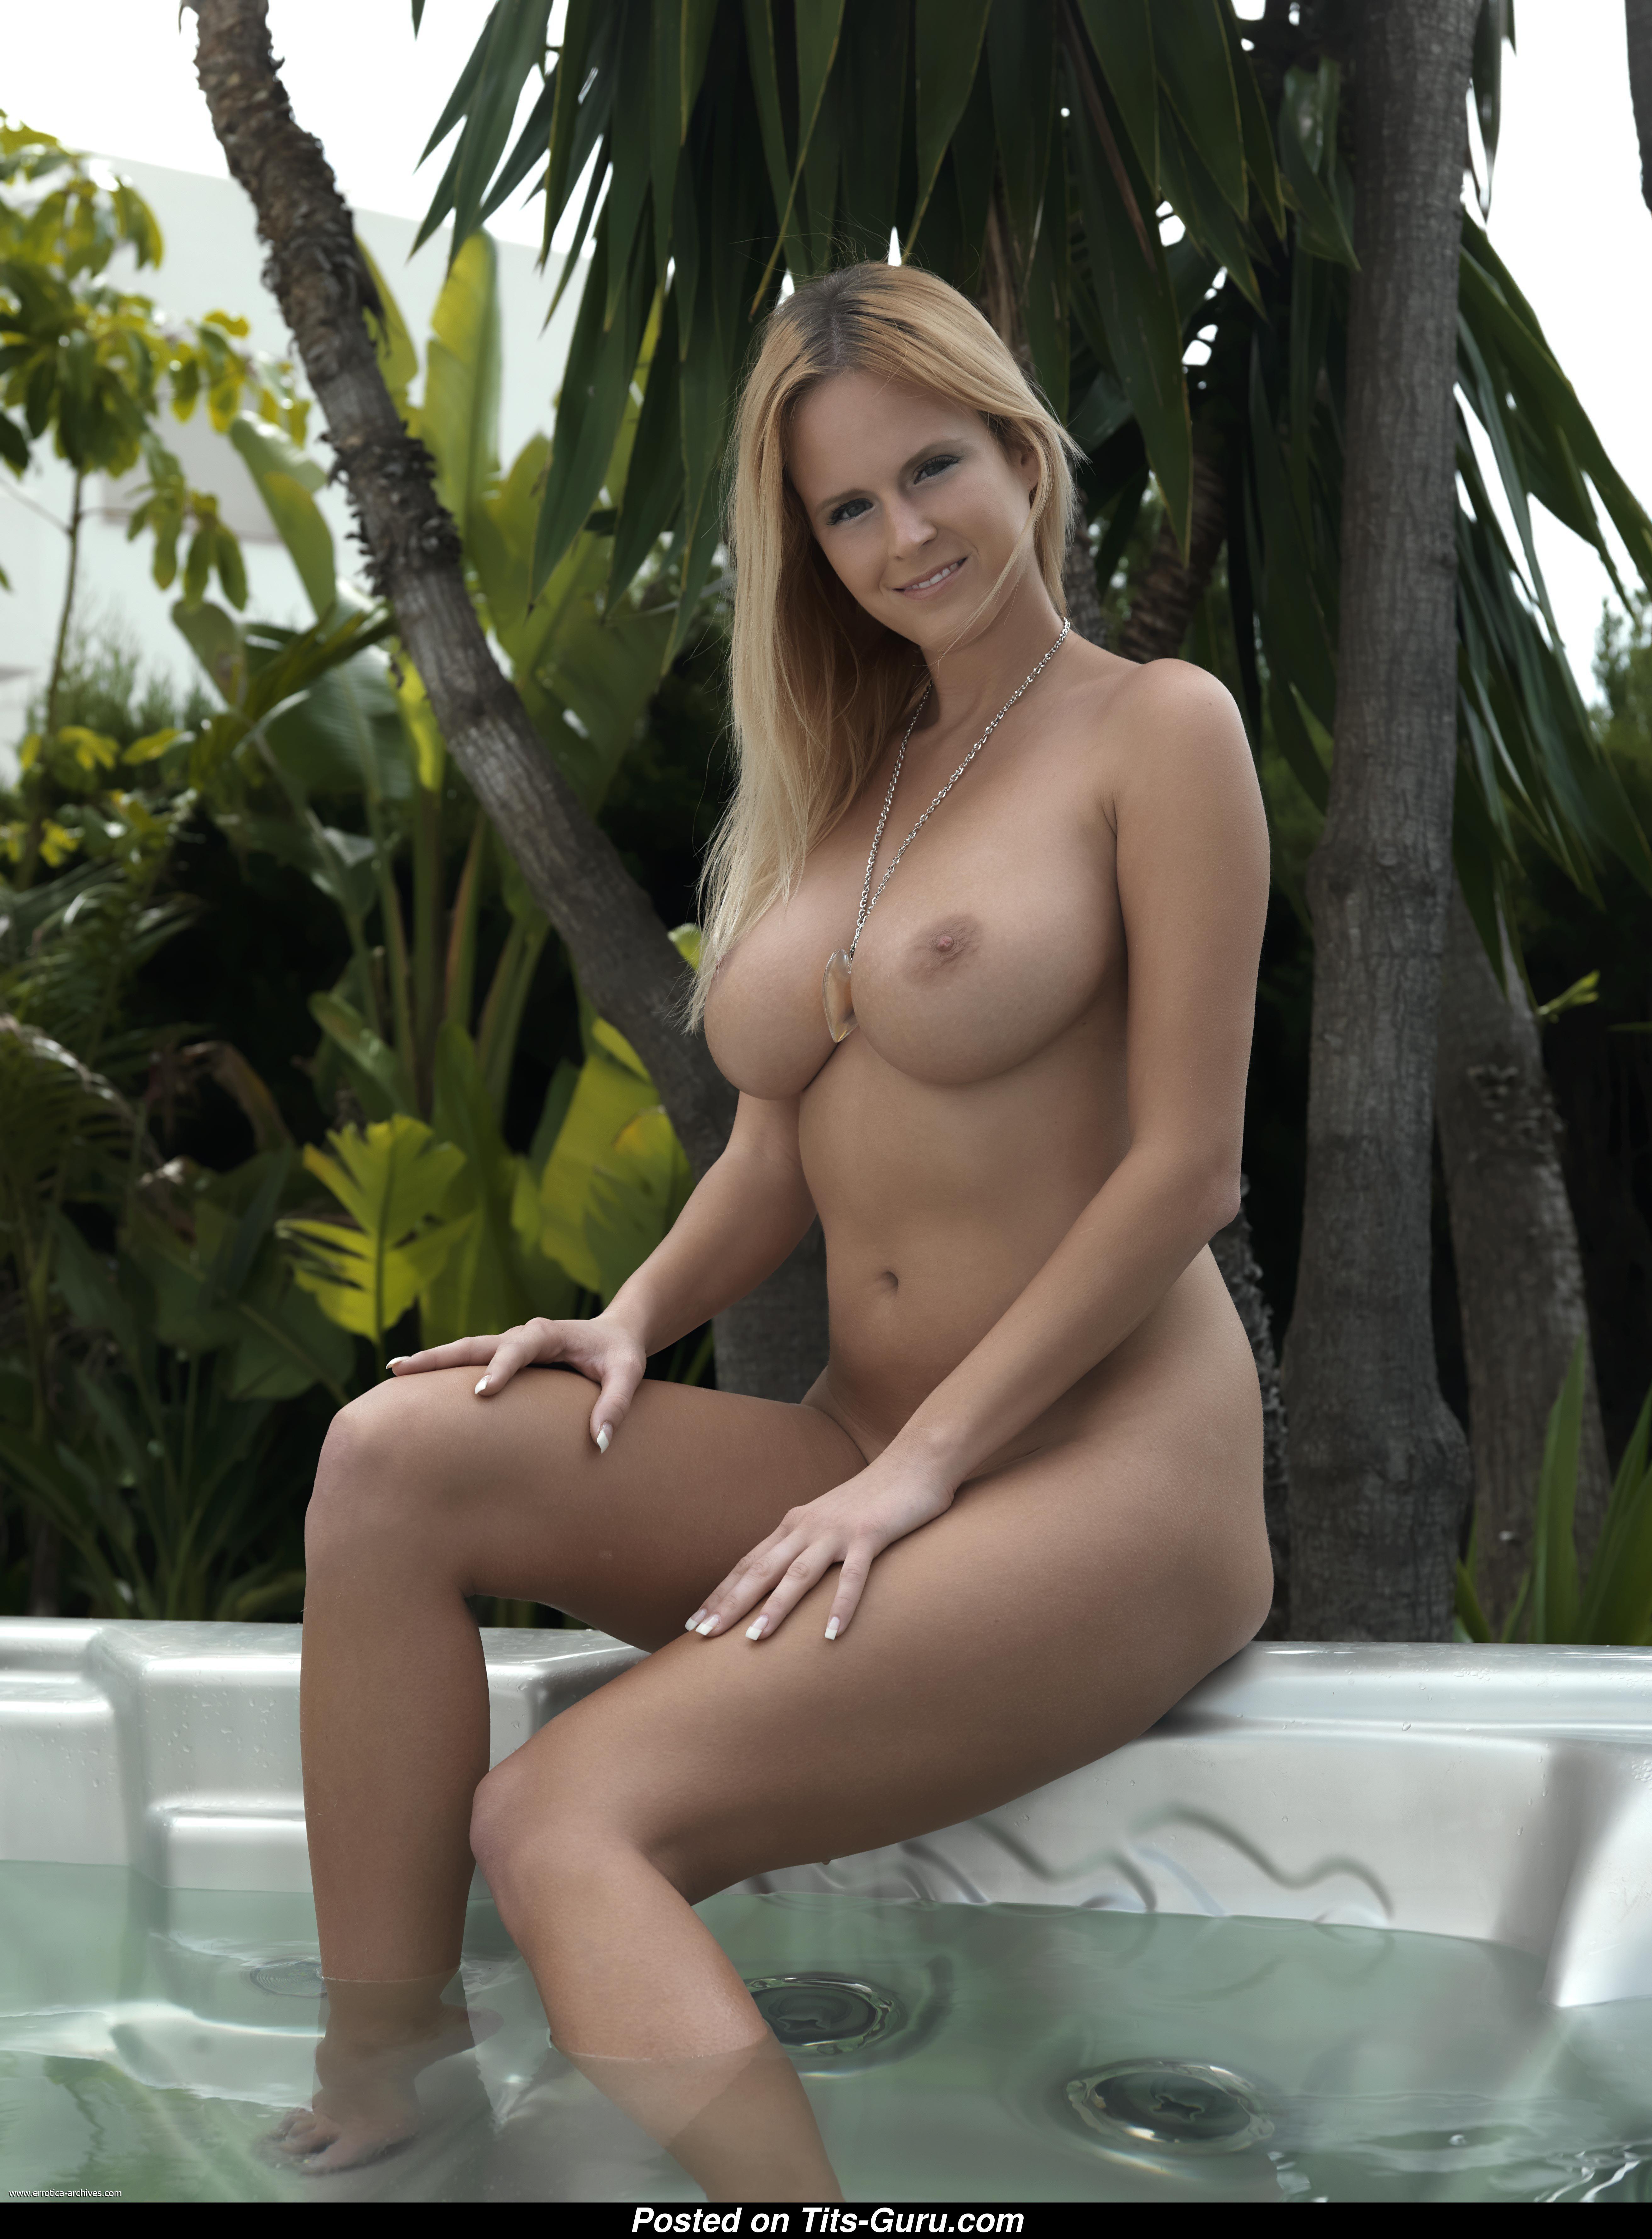 Zuzana Drabinova Nude Photos  Sexy Erotic Girls-2833